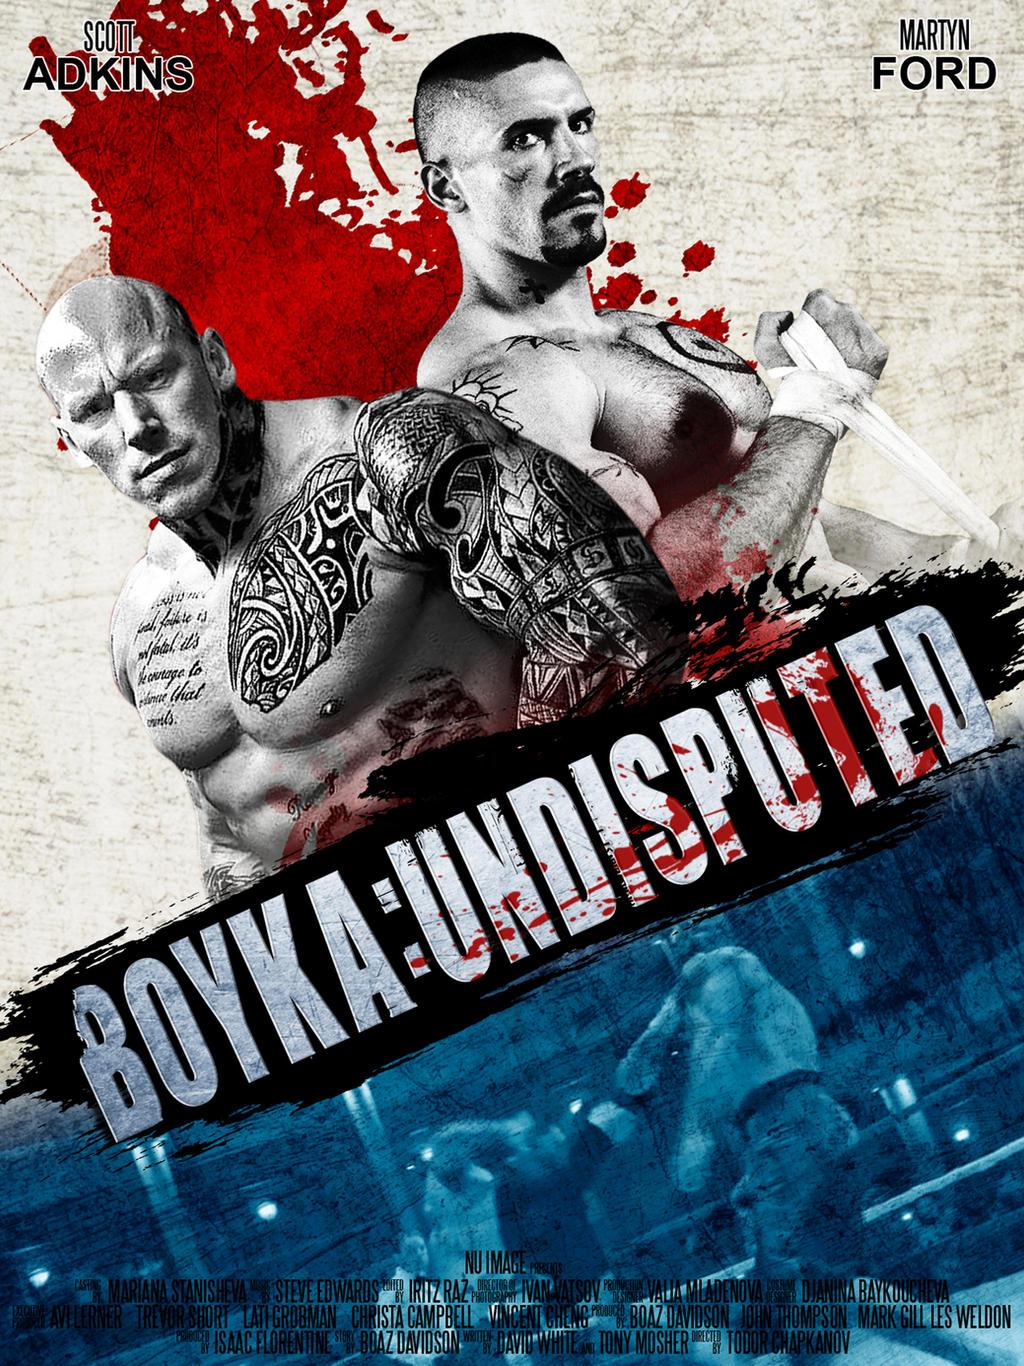 Boyka: Undisputed 2017 Movie Poster by edaba7 on DeviantArt